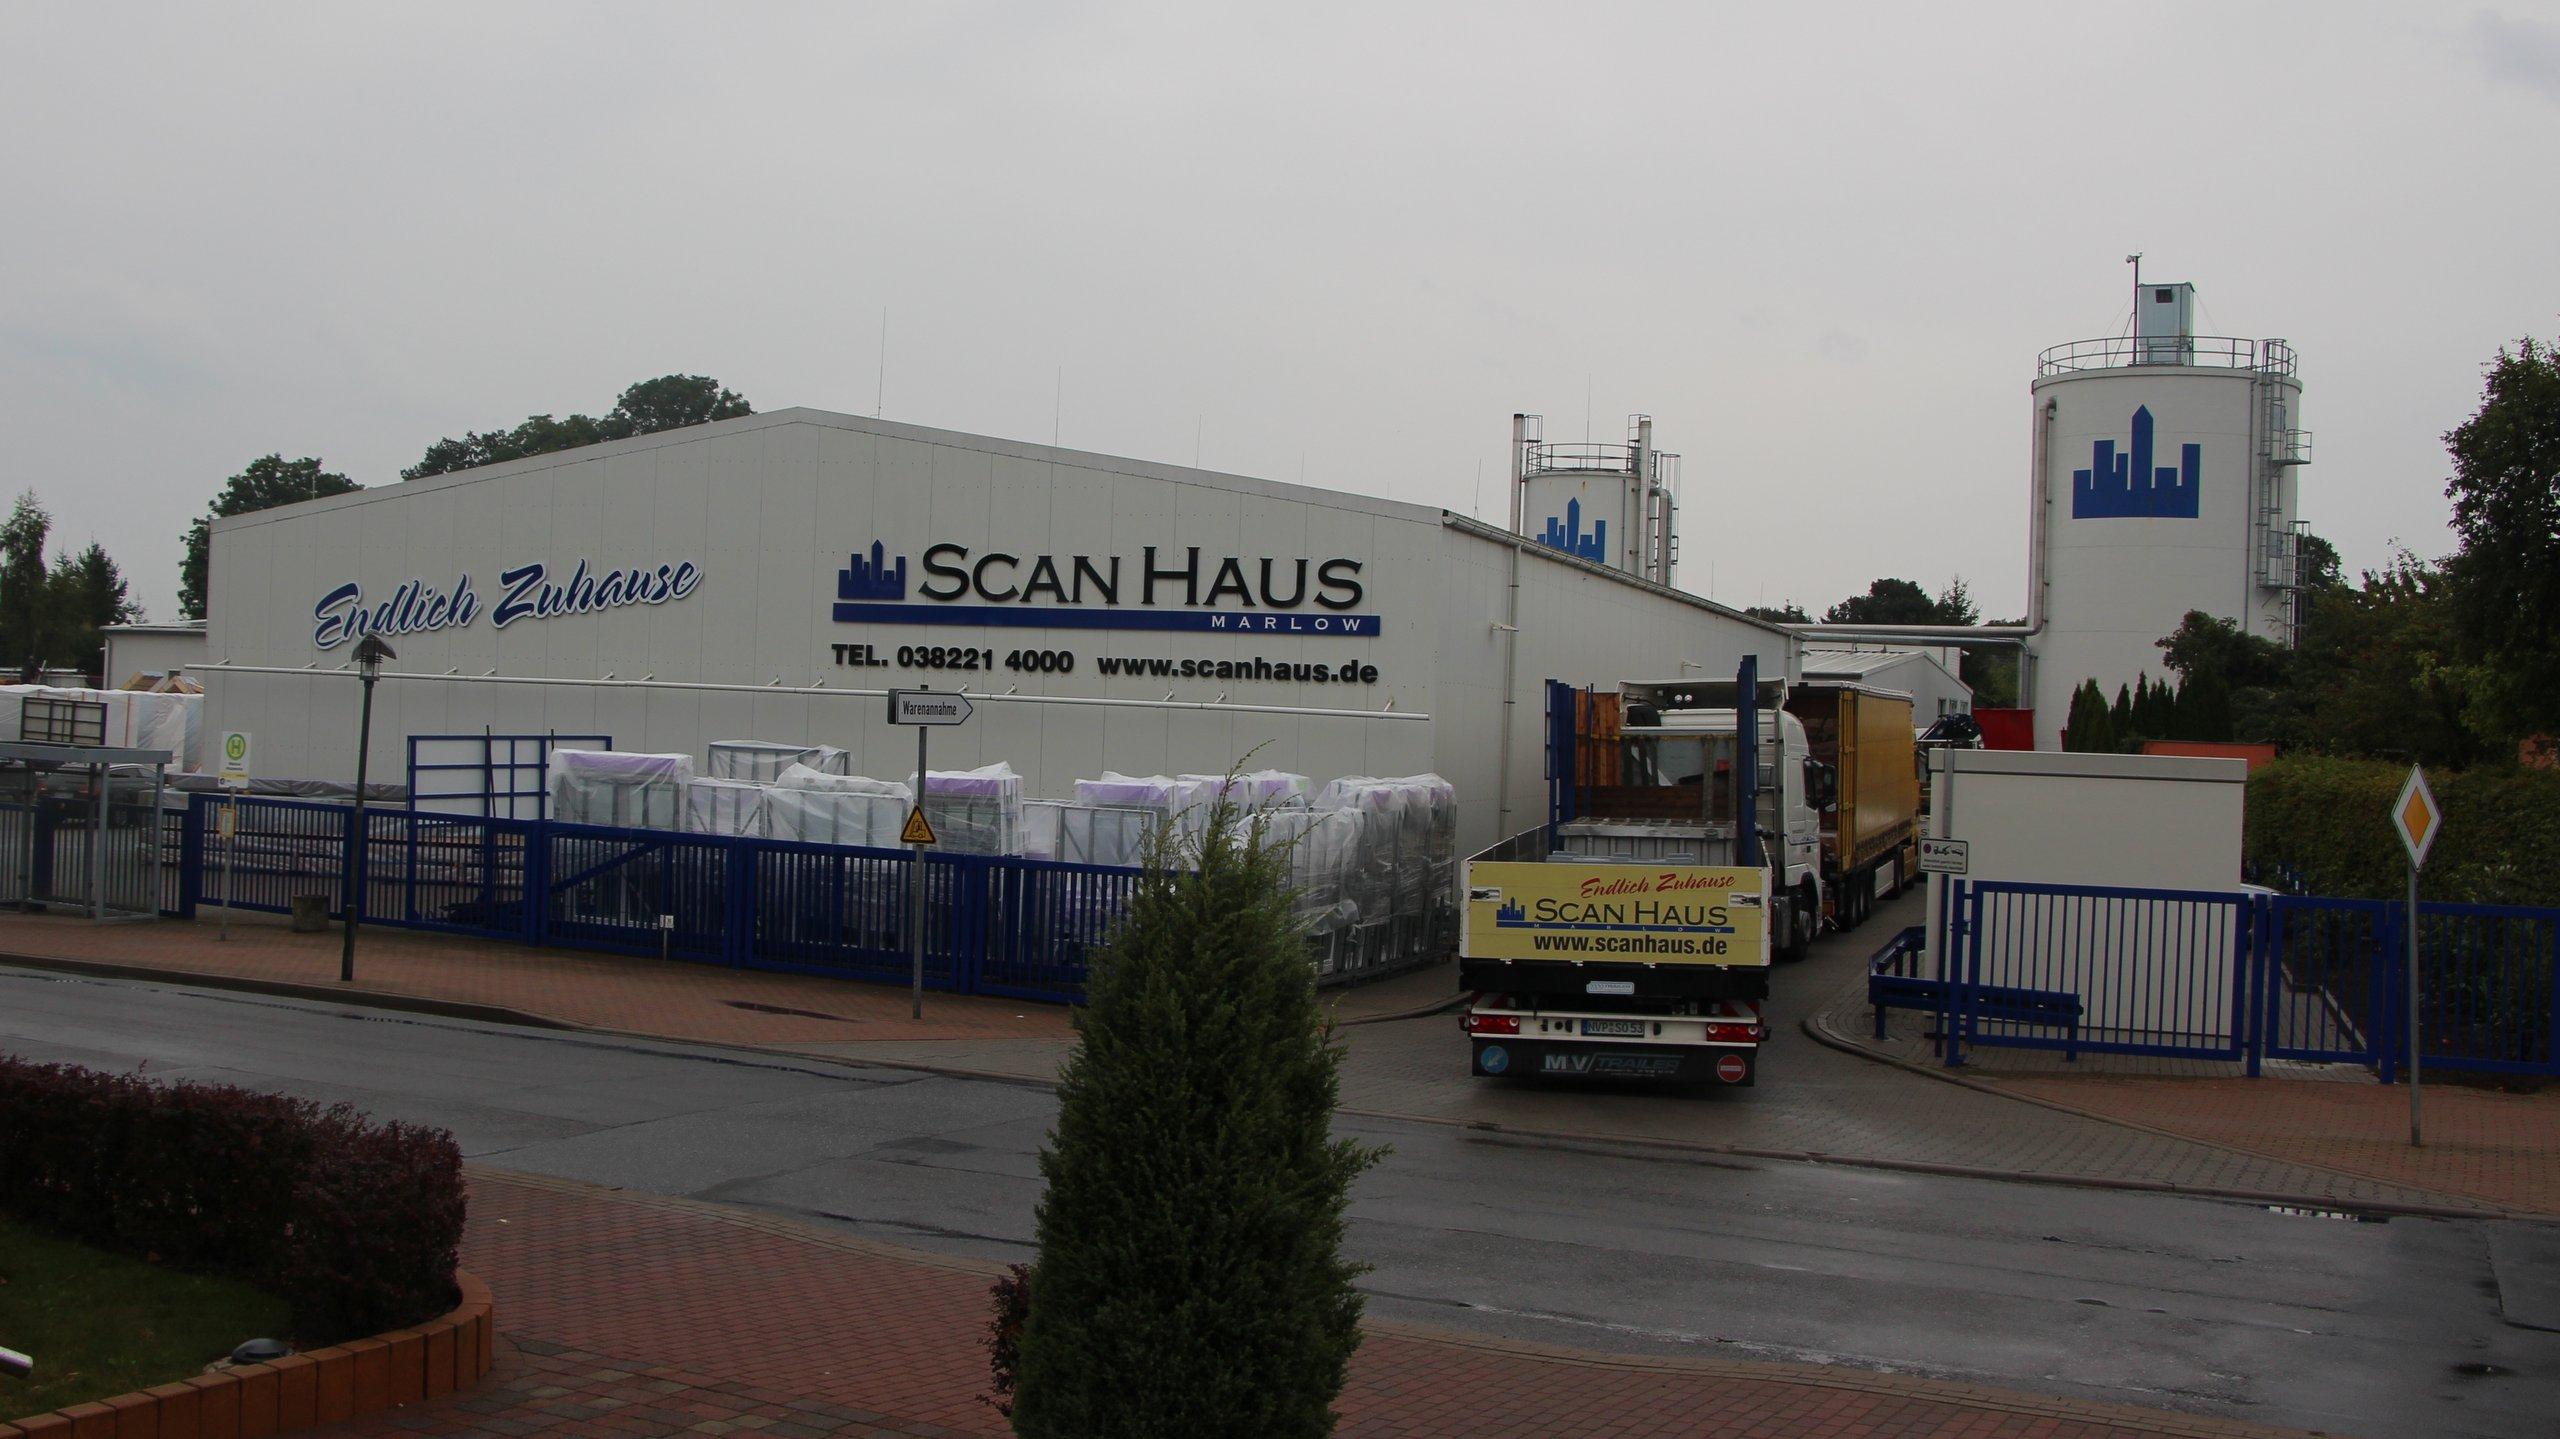 Scanhaus De scanhaus marlow tablers 201